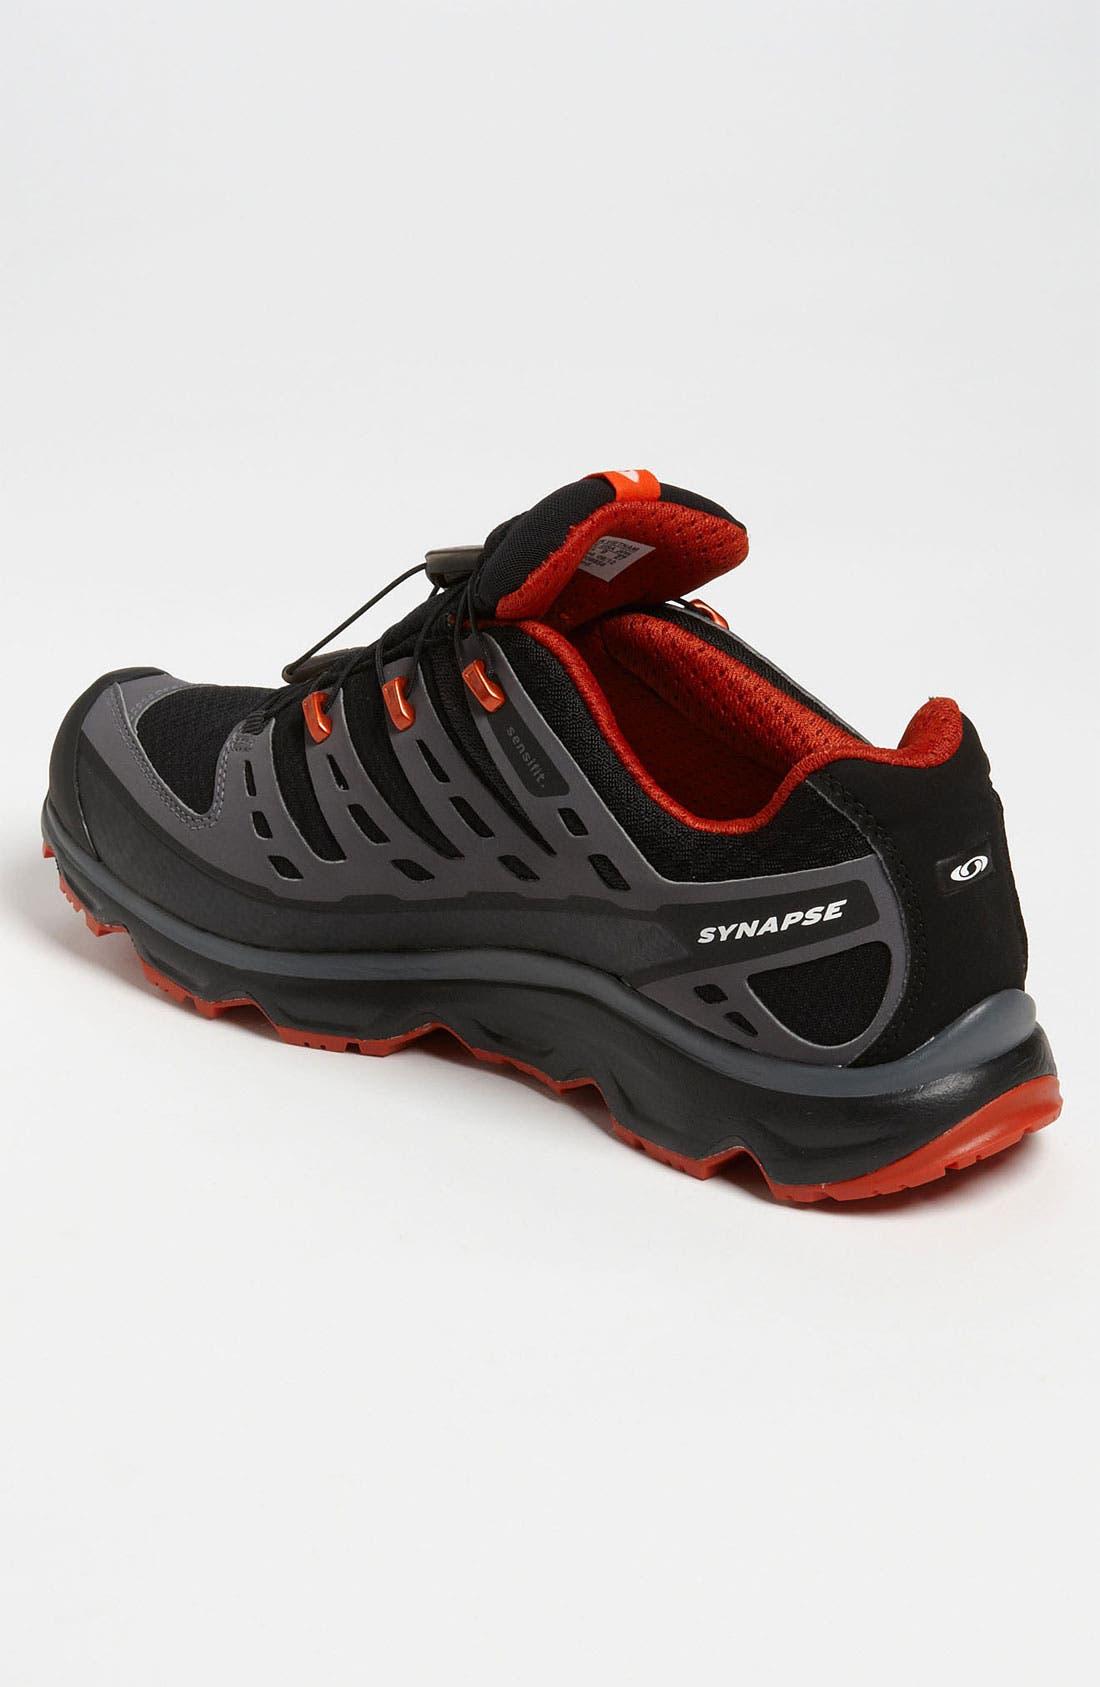 Alternate Image 2  - Salomon 'Synapse CS' Hiking Shoe (Men)